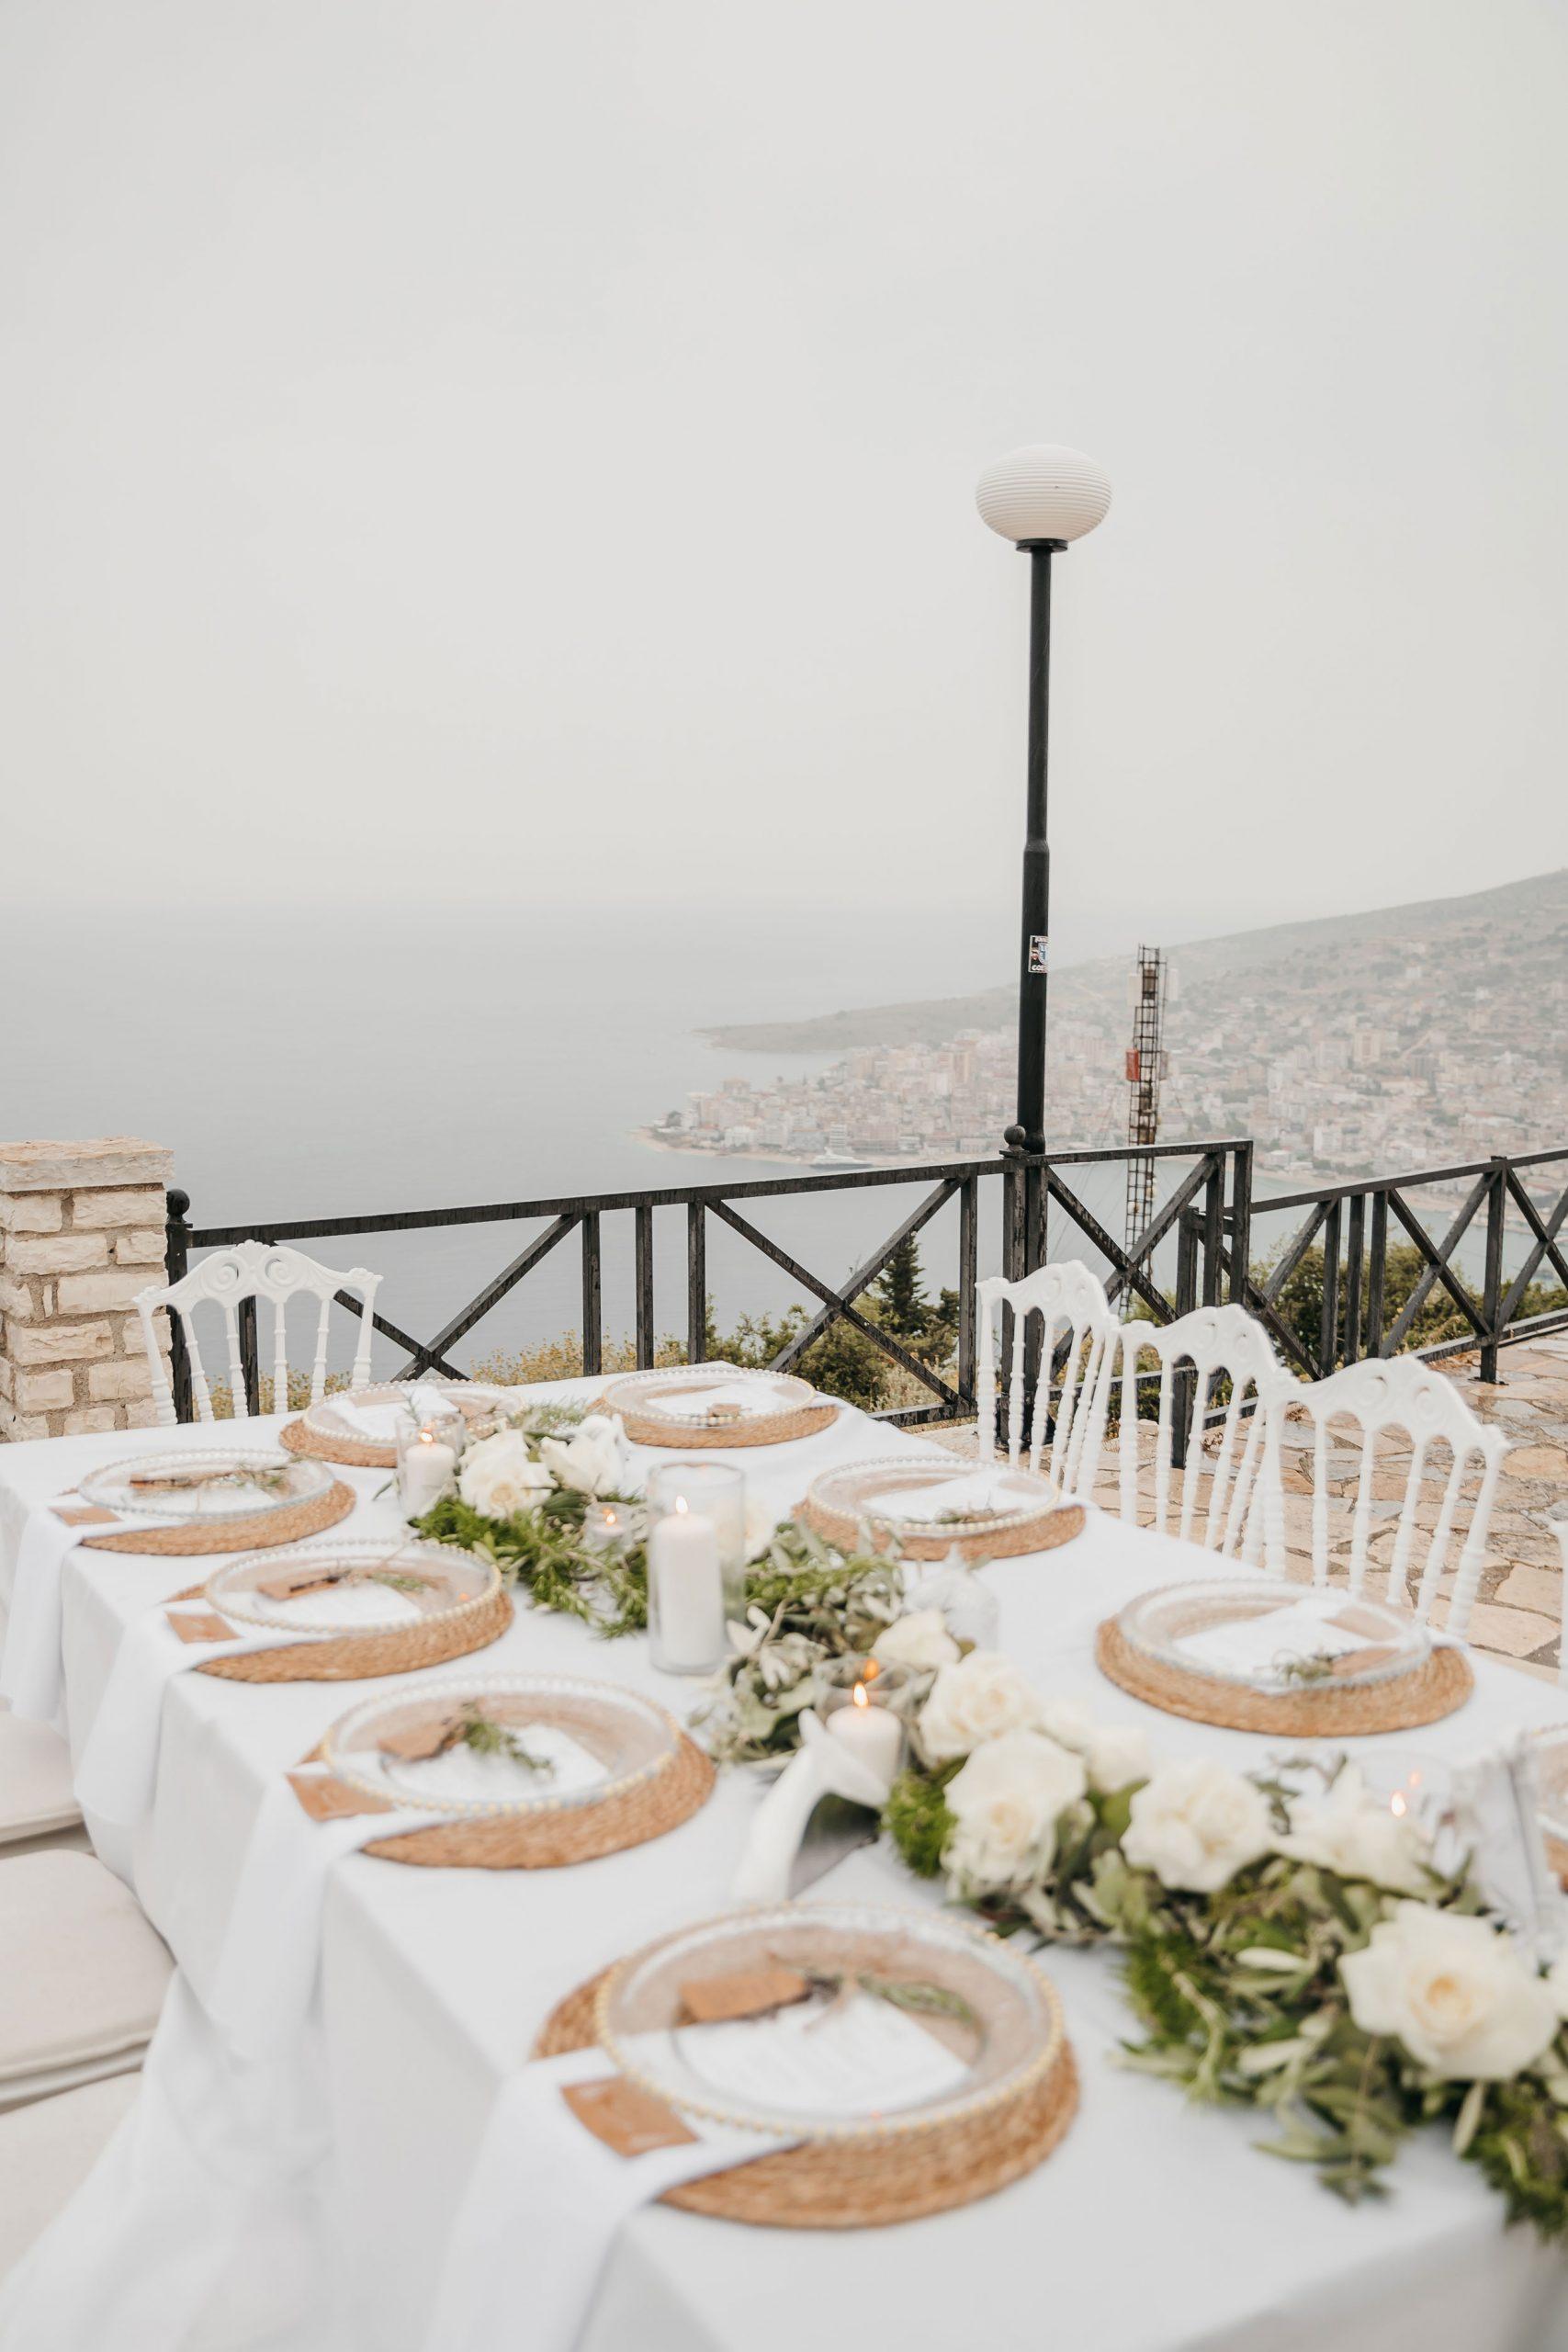 Picturesque view from Lekuresi Castle wedding